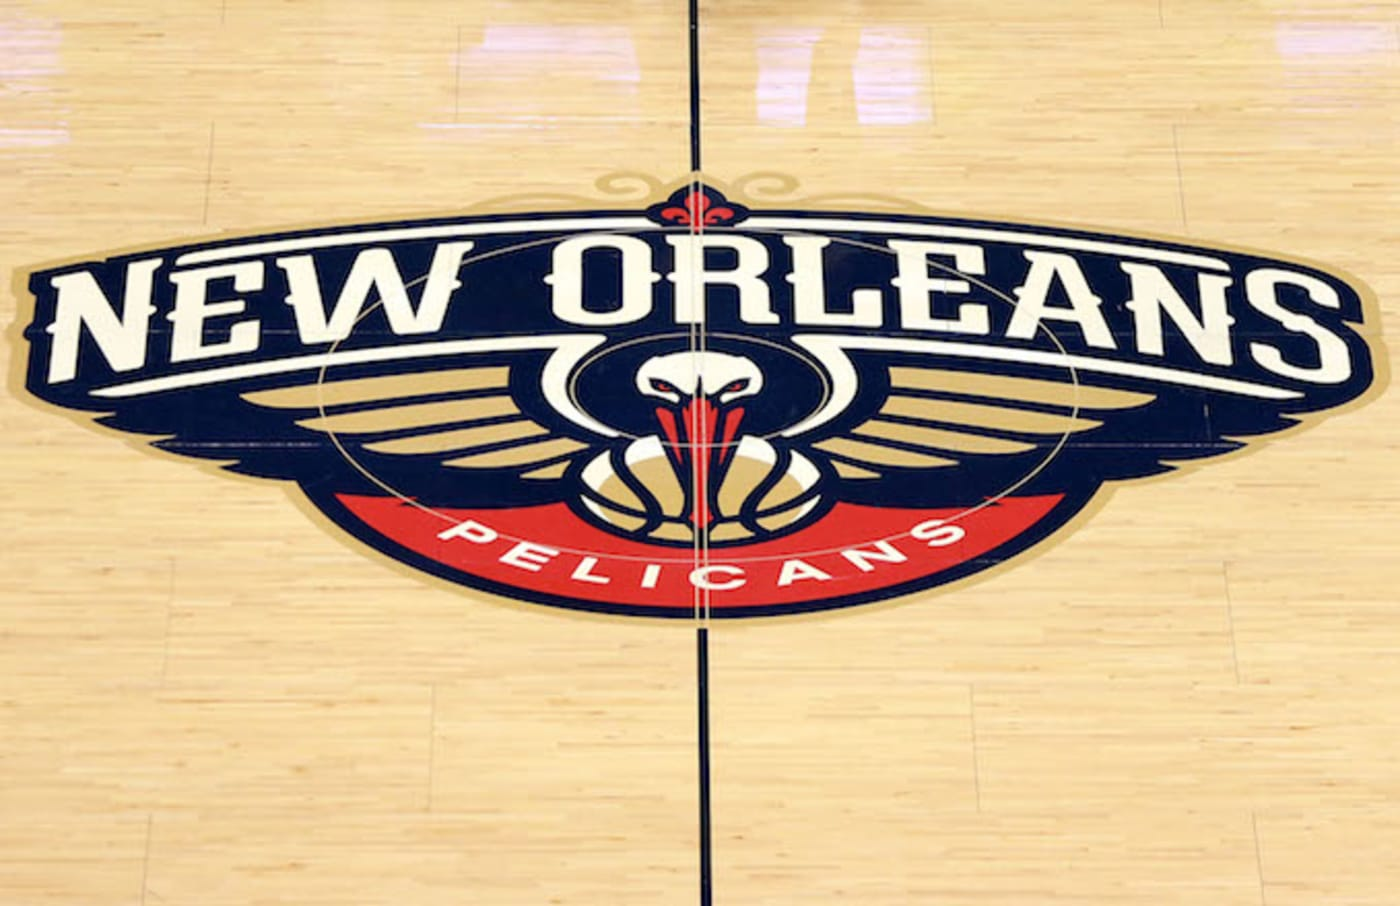 New Orleans Pelicans logo sits center court